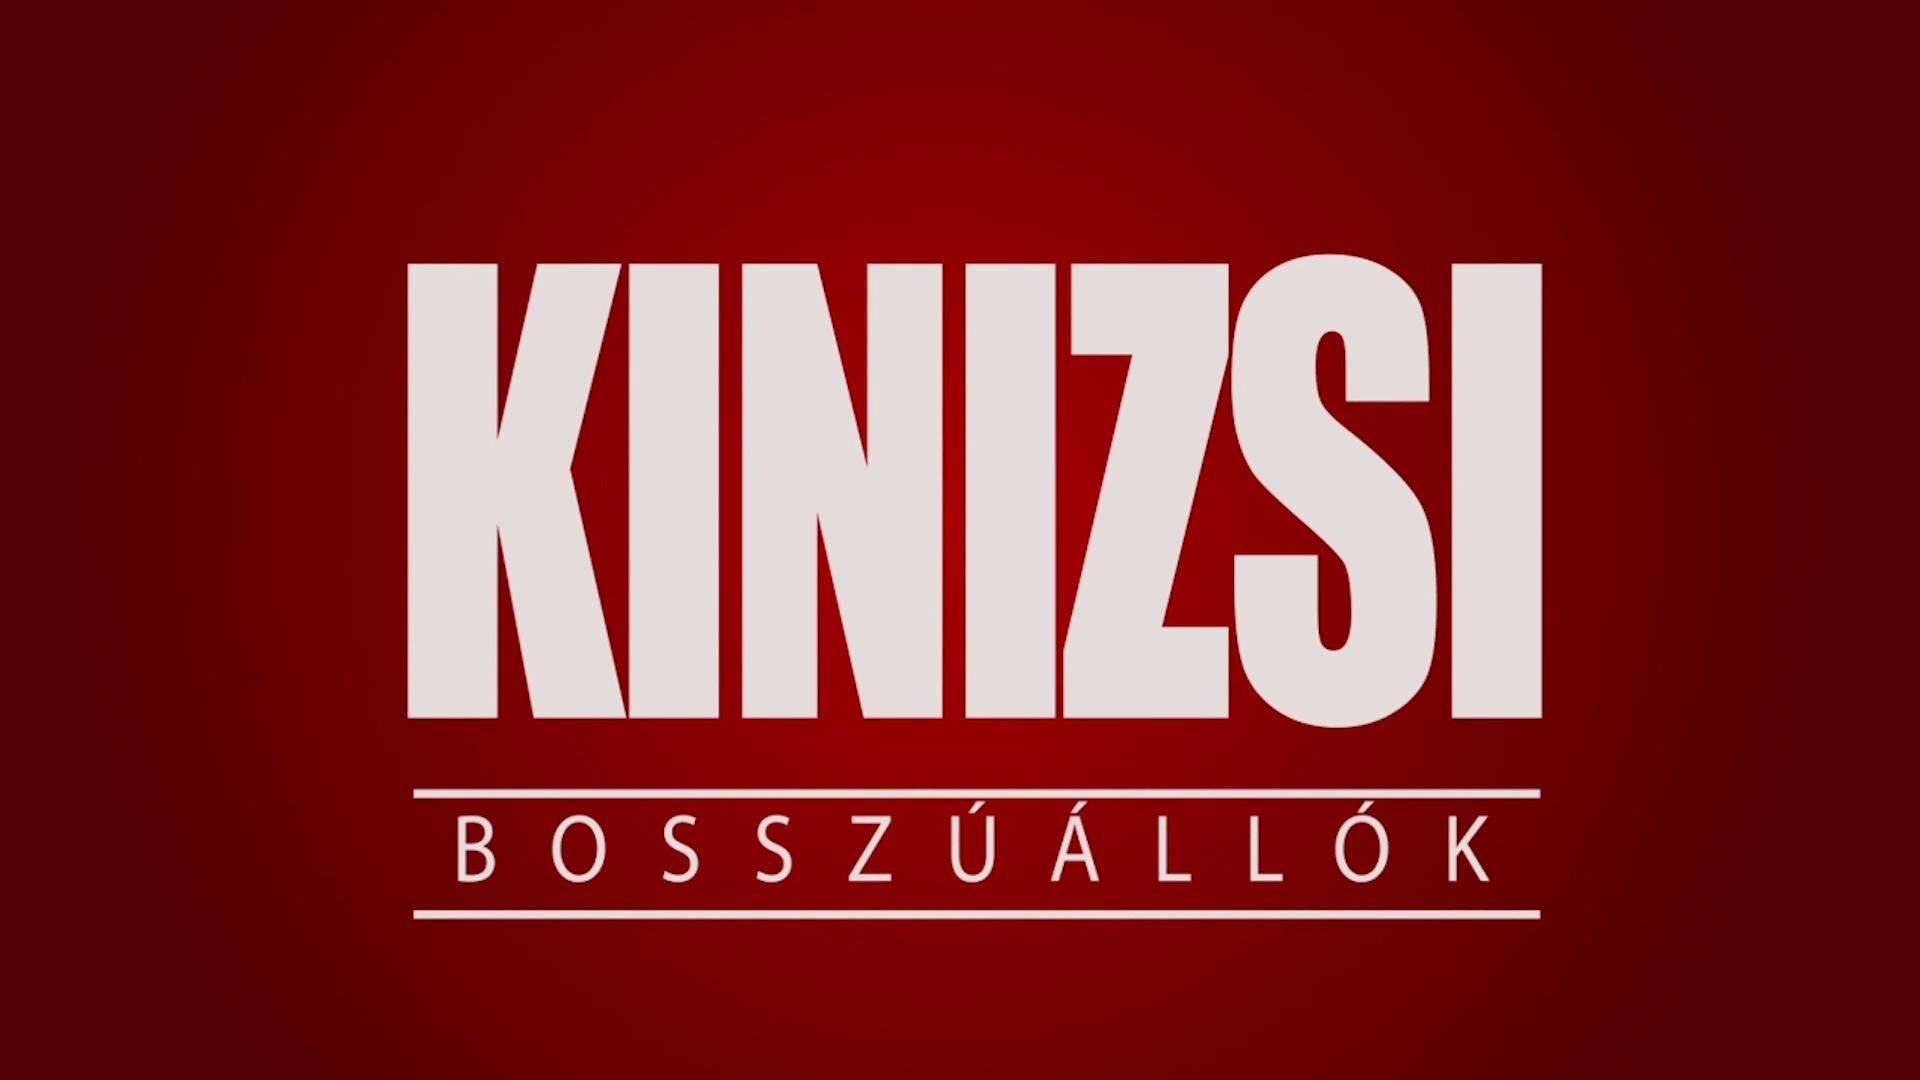 kinizs1002017-bosszuallok